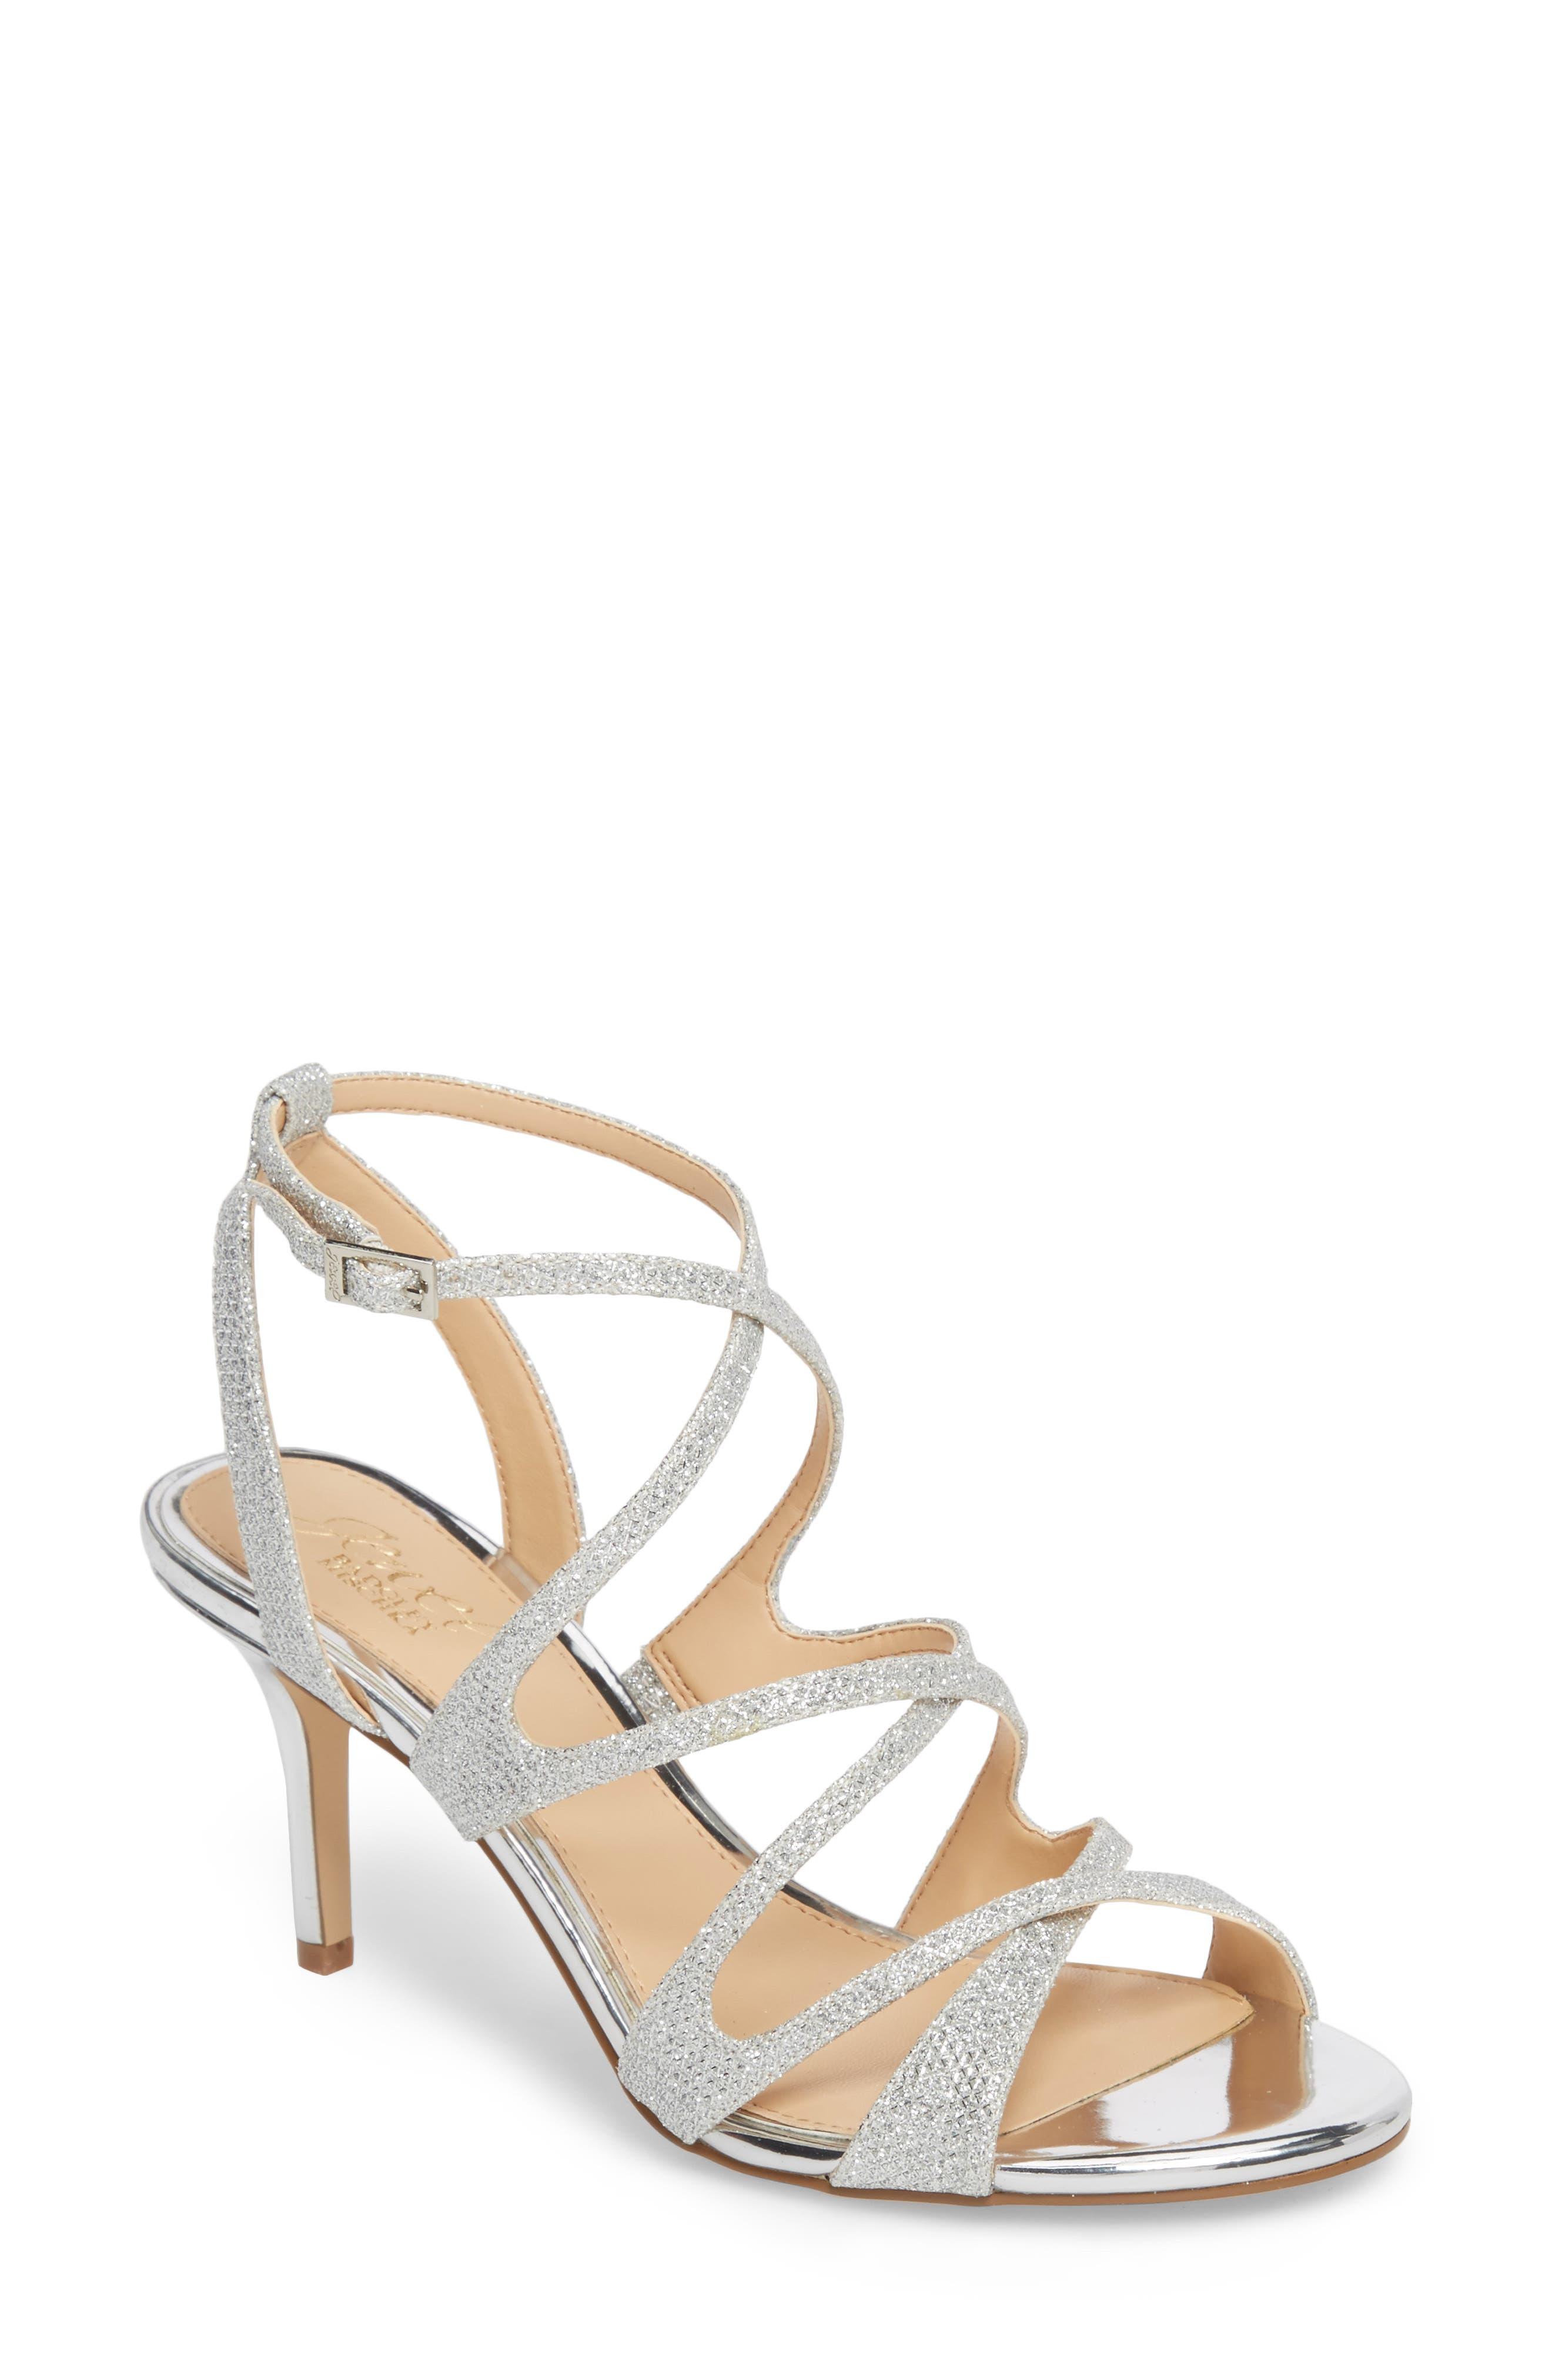 Tasha Glitter Sandal,                         Main,                         color, 043